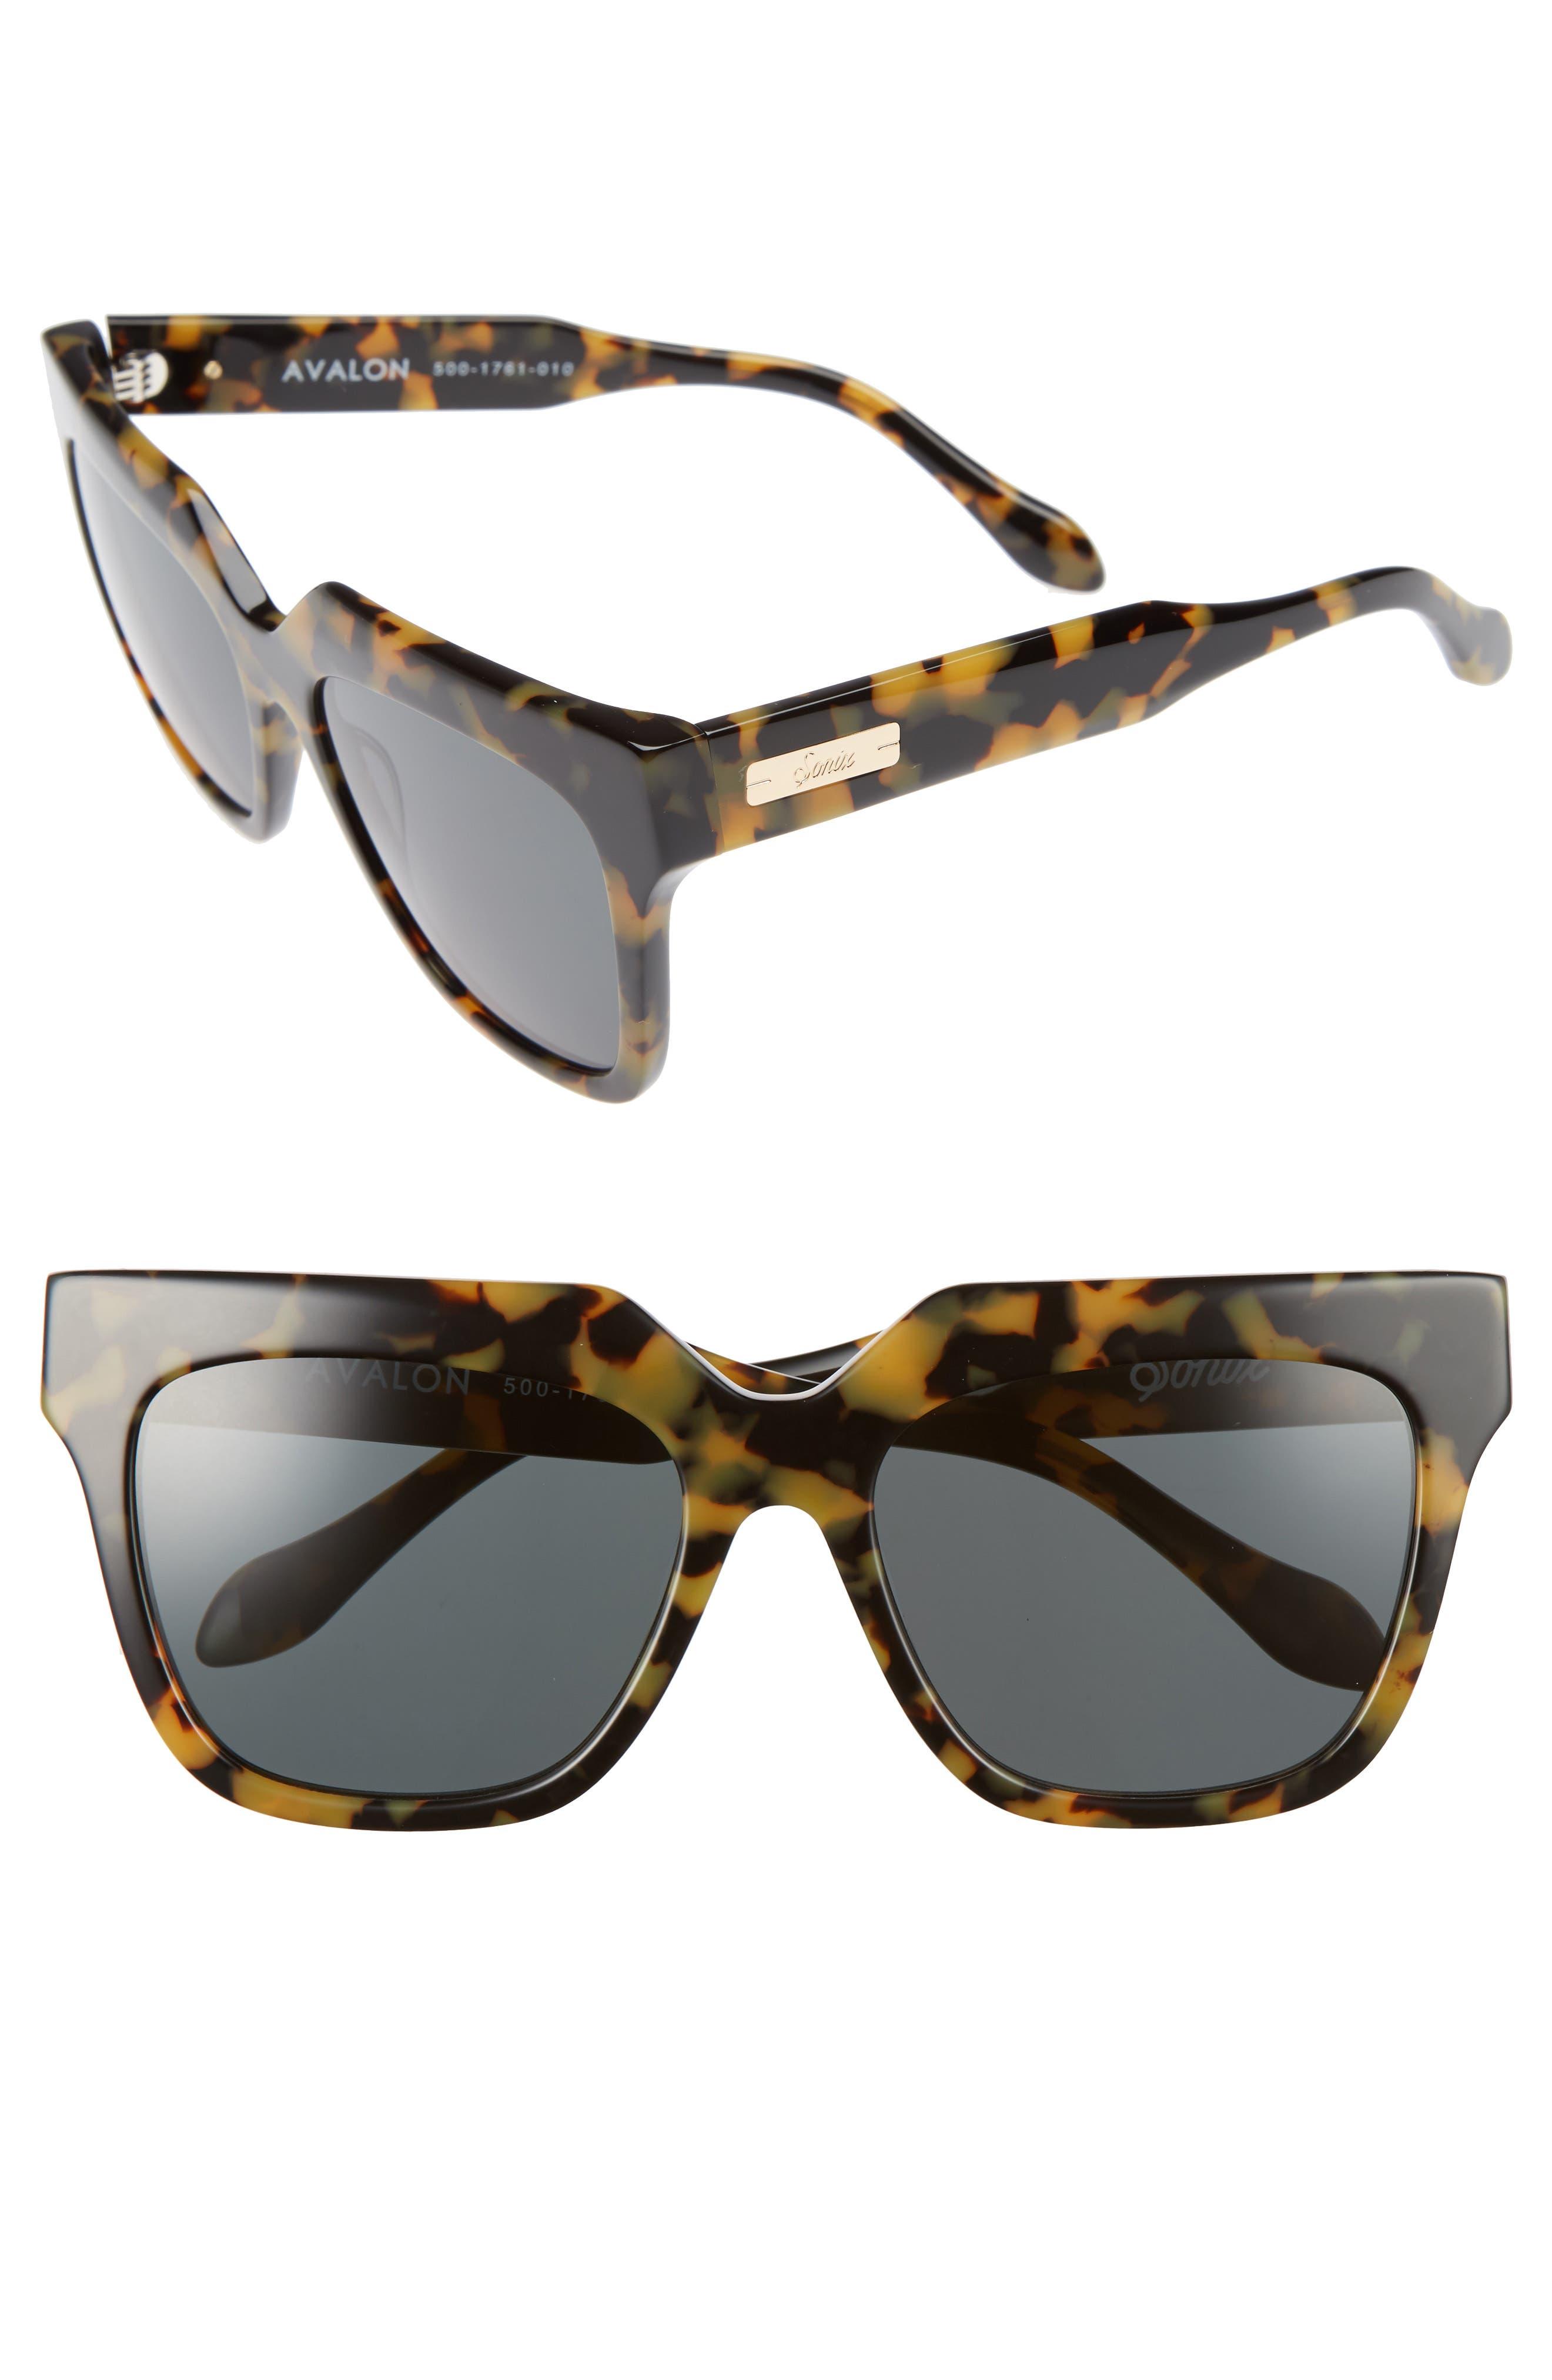 Main Image - Sonix Avalon 57mm Retro Sunglasses